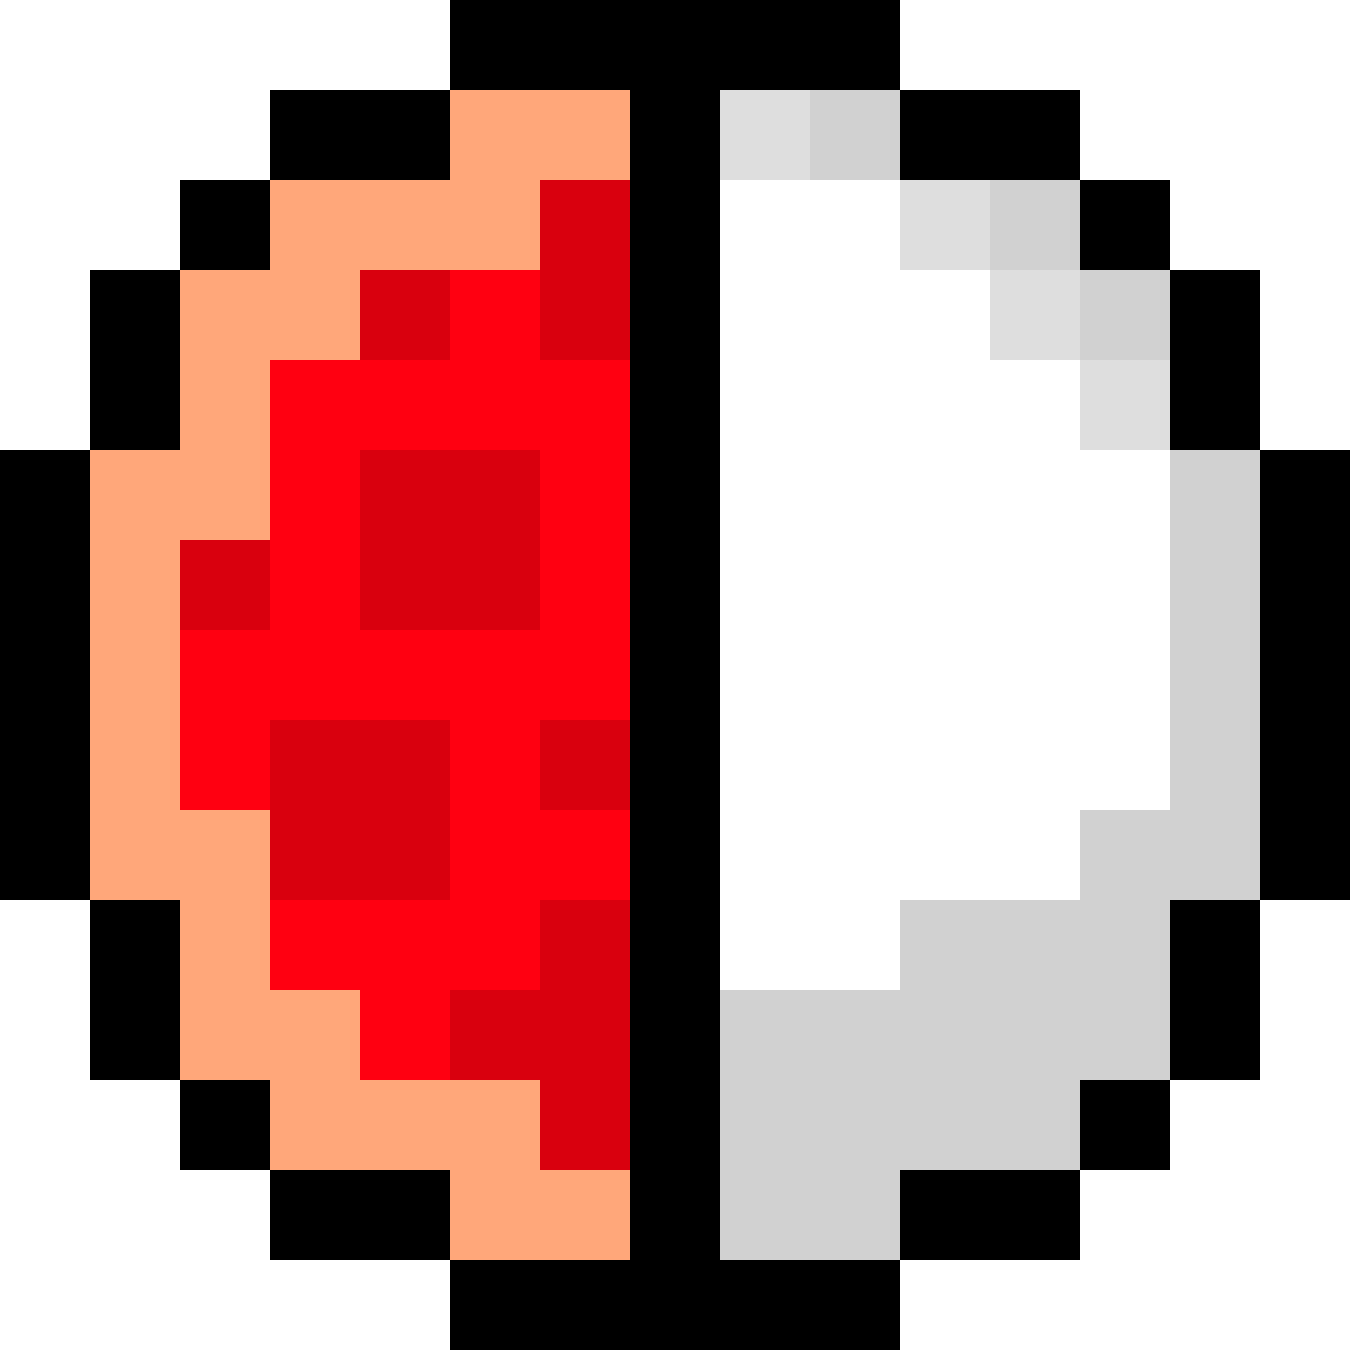 Pixel art maker . Fraction clipart square